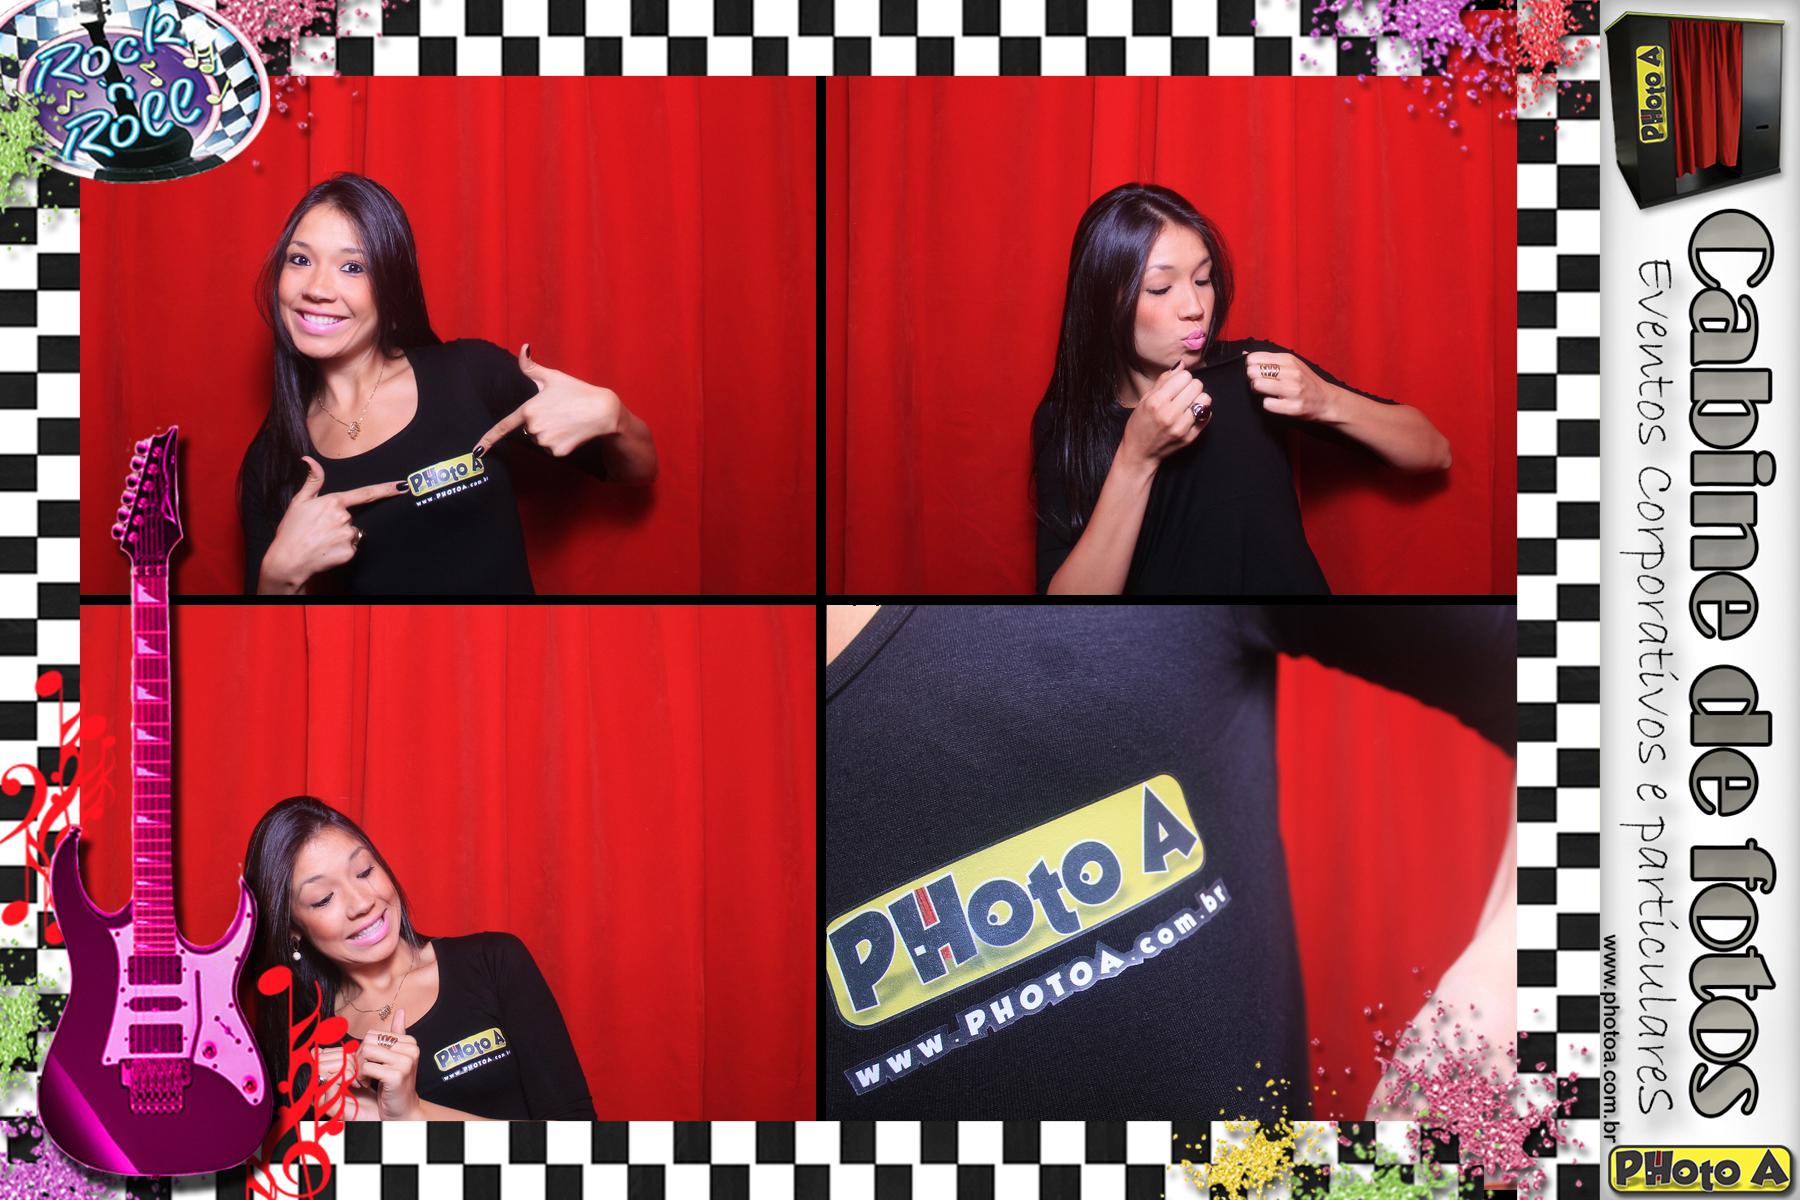 Exemplos Fotos - Photo A (exemplo 3) - cabine de fotos - fotocabine - fotos cabine - photo booth - maquina de fotos